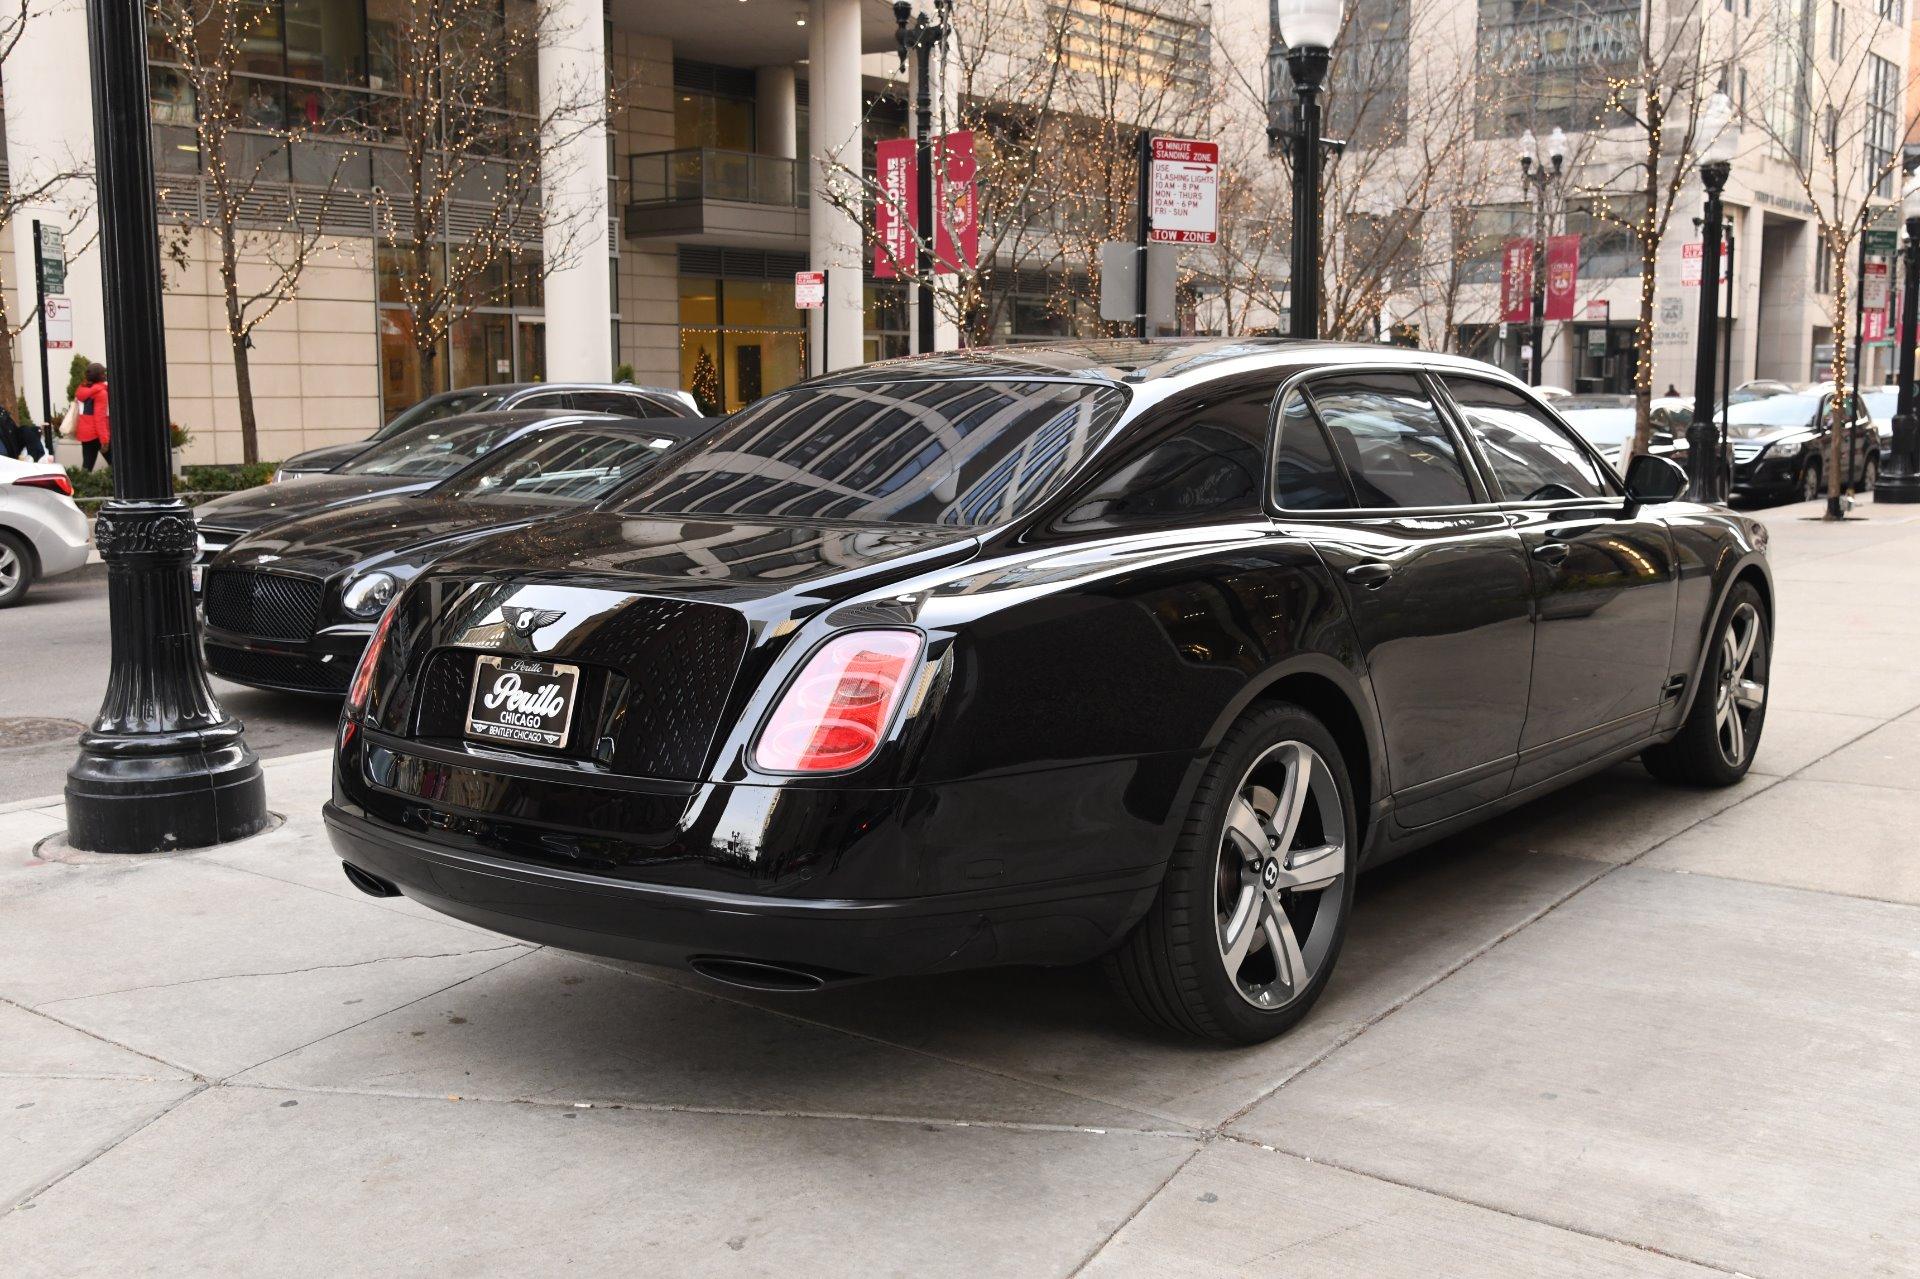 2012 Bentley Mulsanne Stock # R160B For Sale Near Chicago